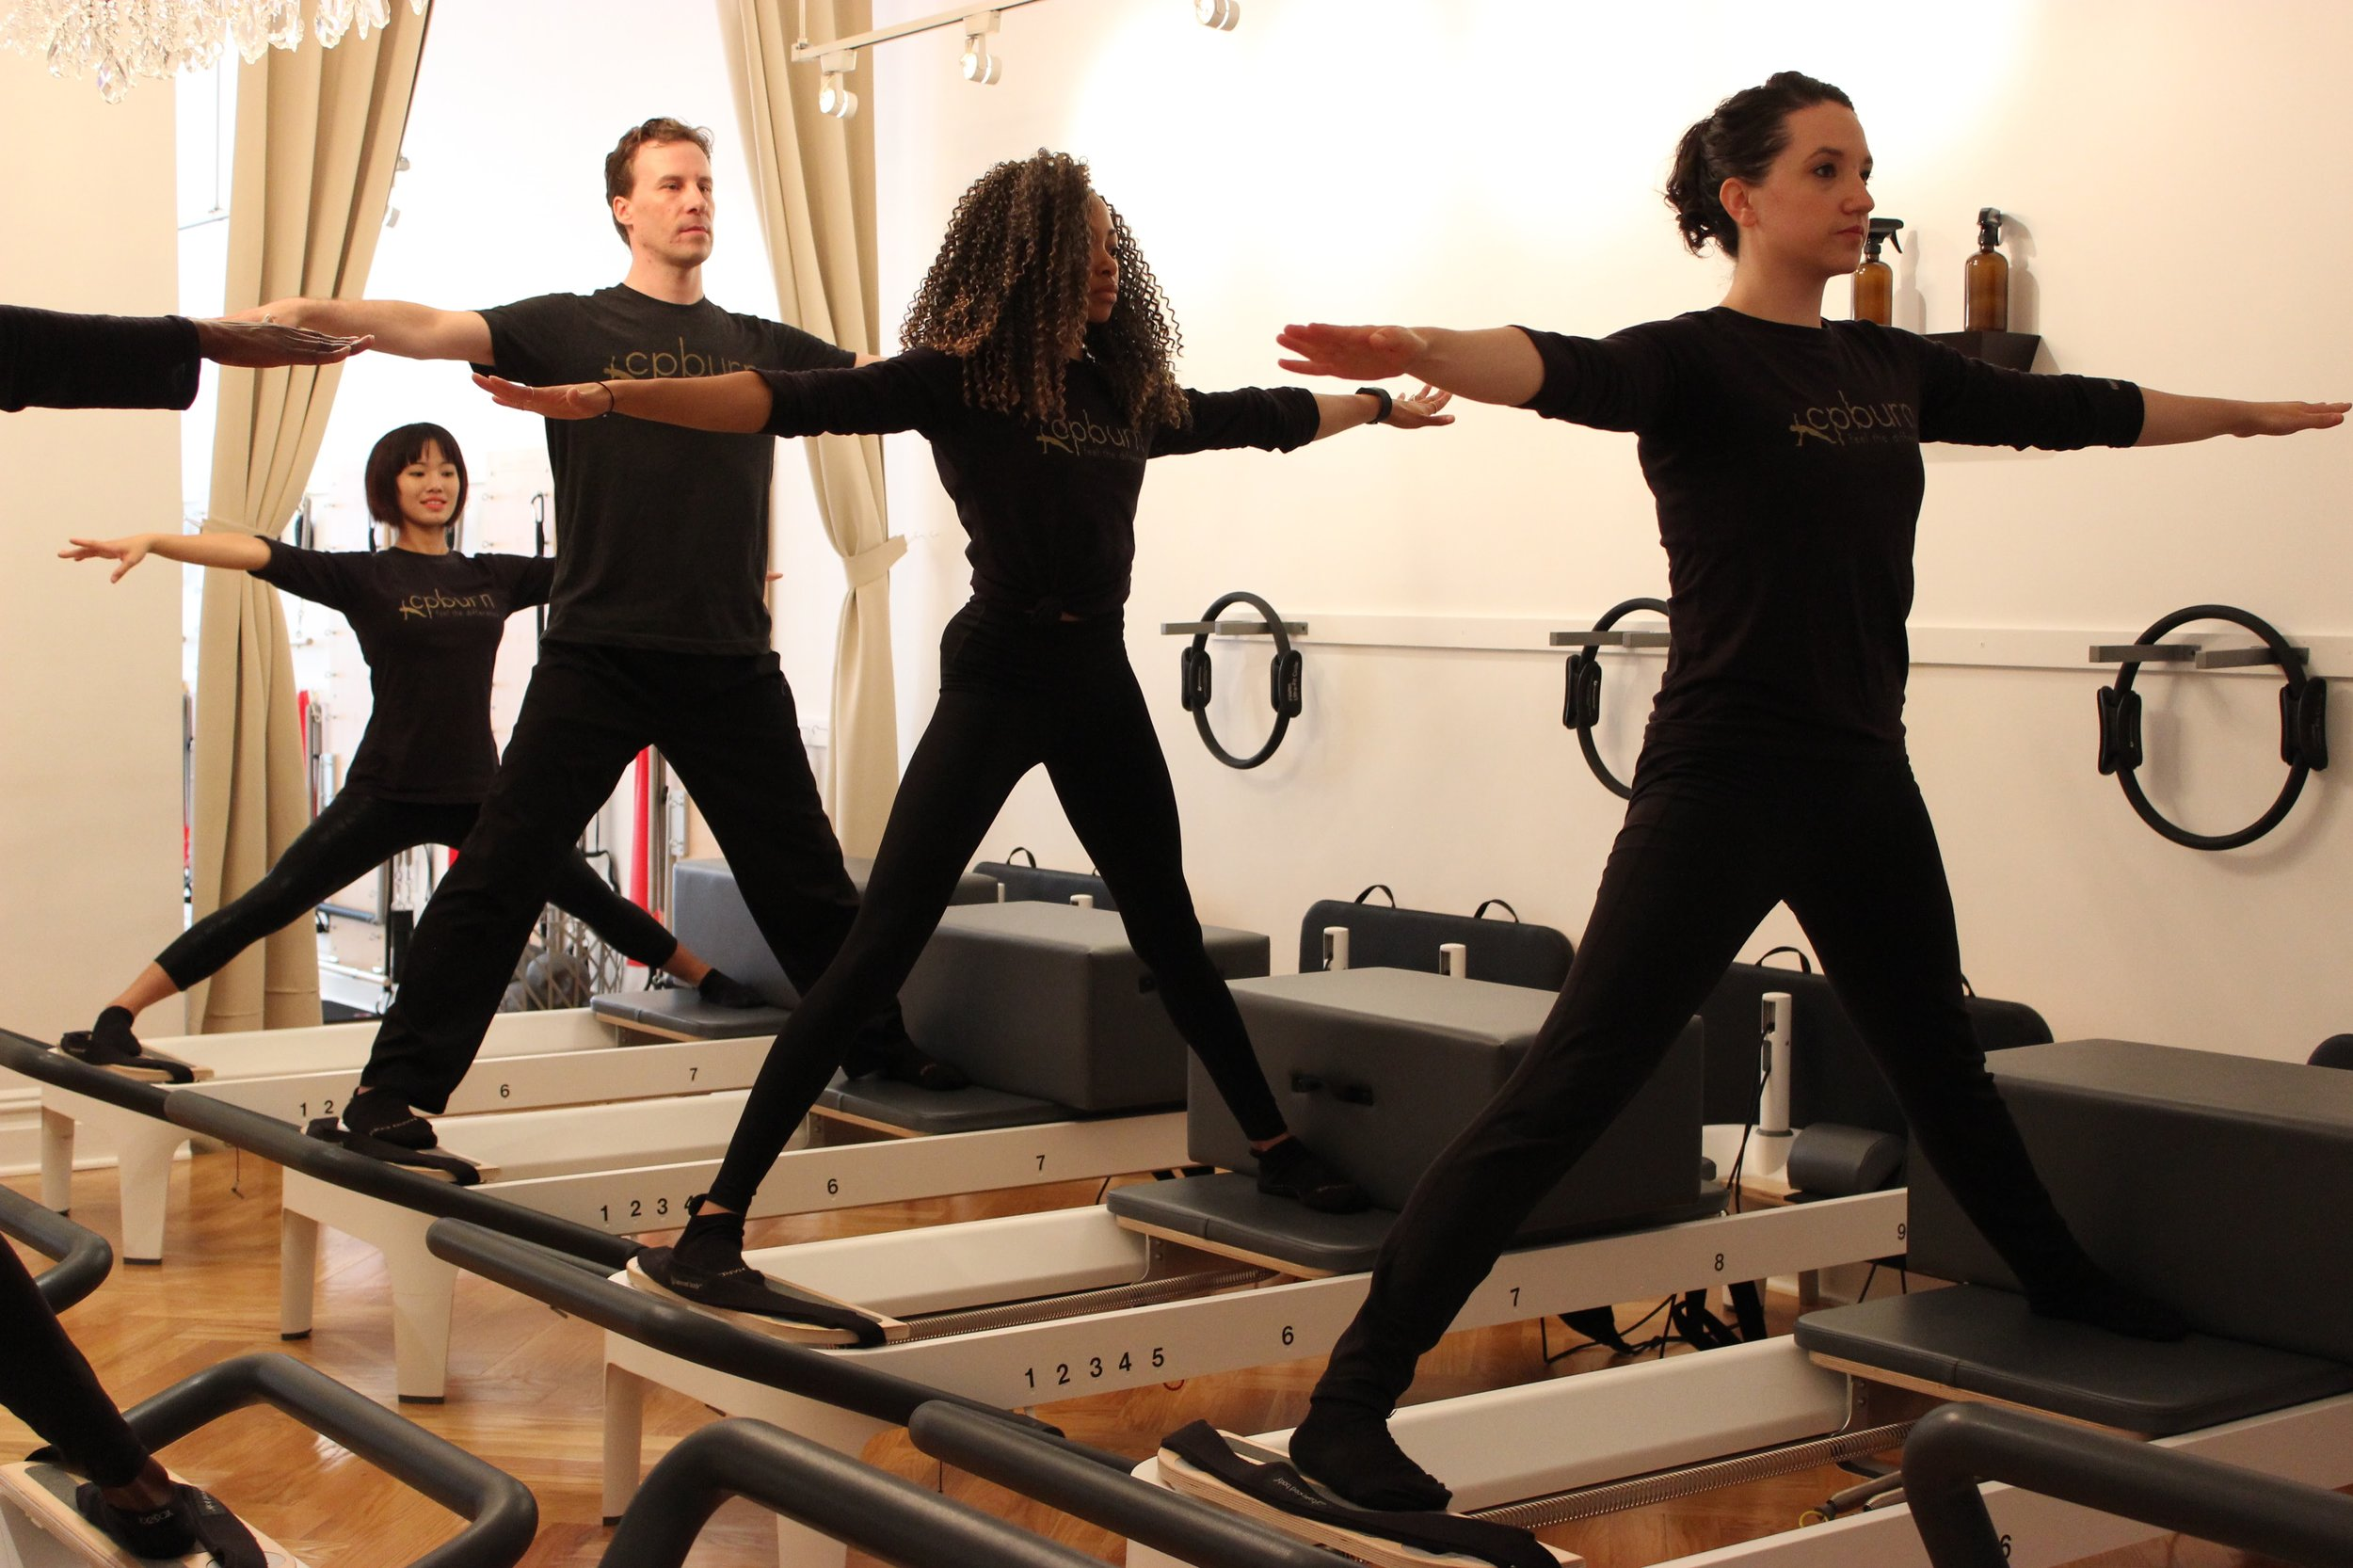 group-pilates-classes-upper-east-side-sutton-place